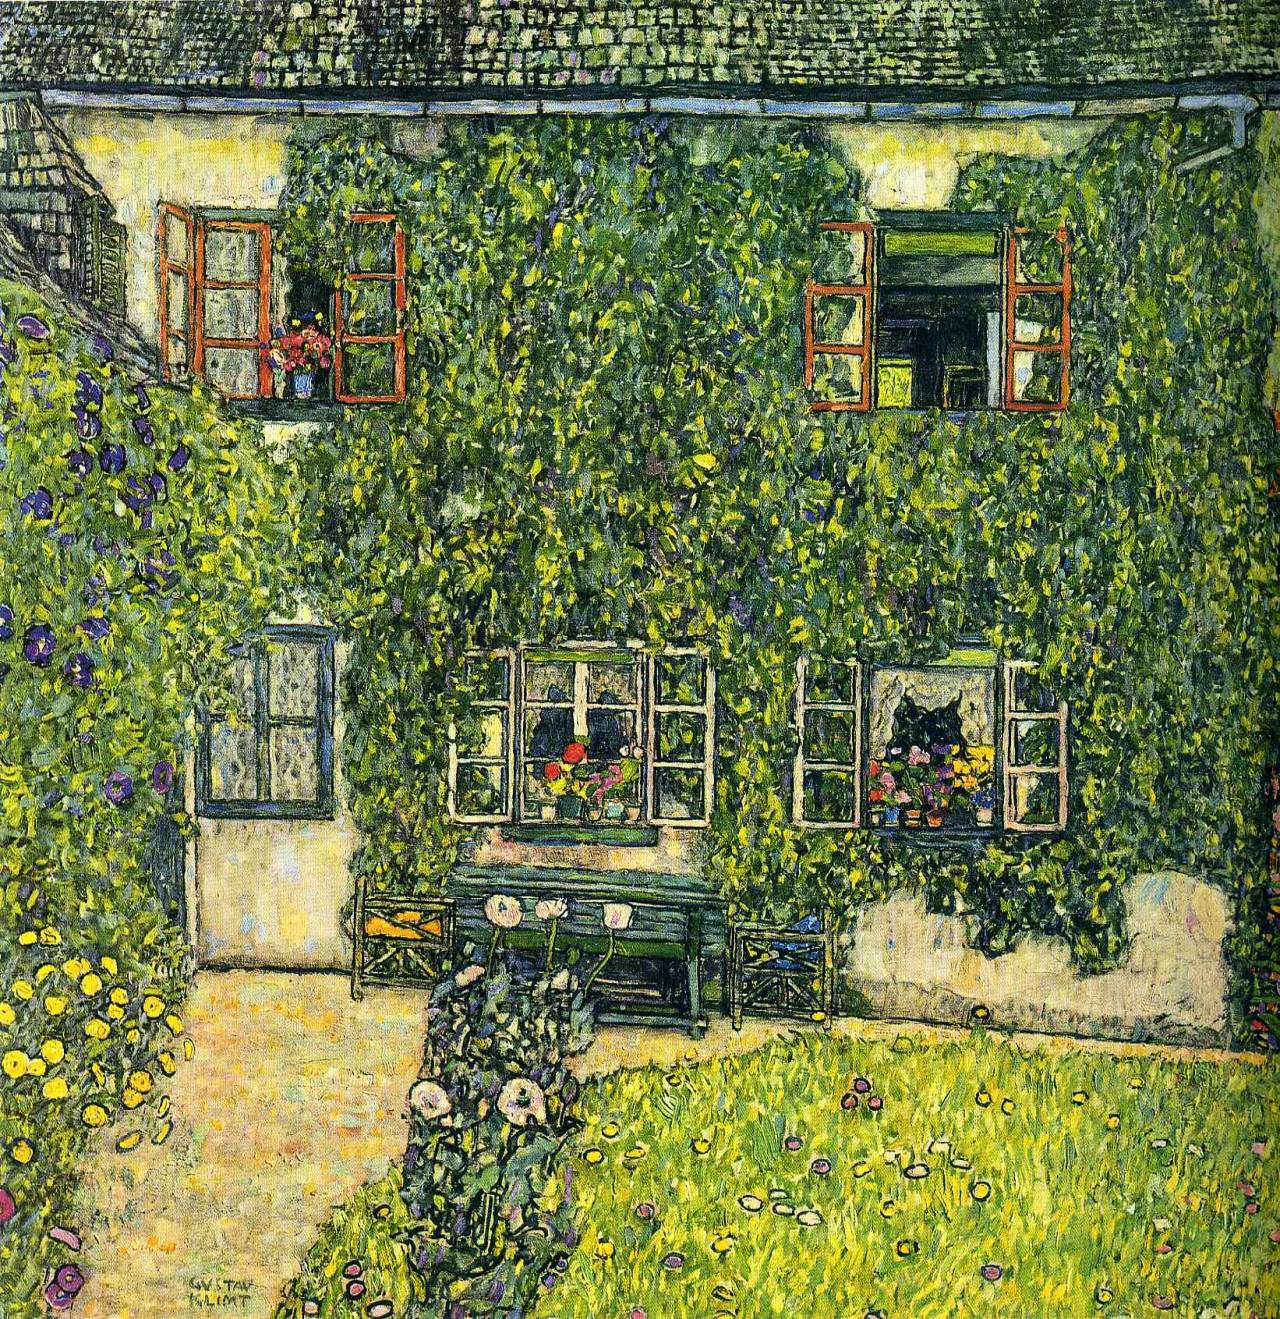 thusreluctant: The House of Guardaboschi by Gustav Klimt